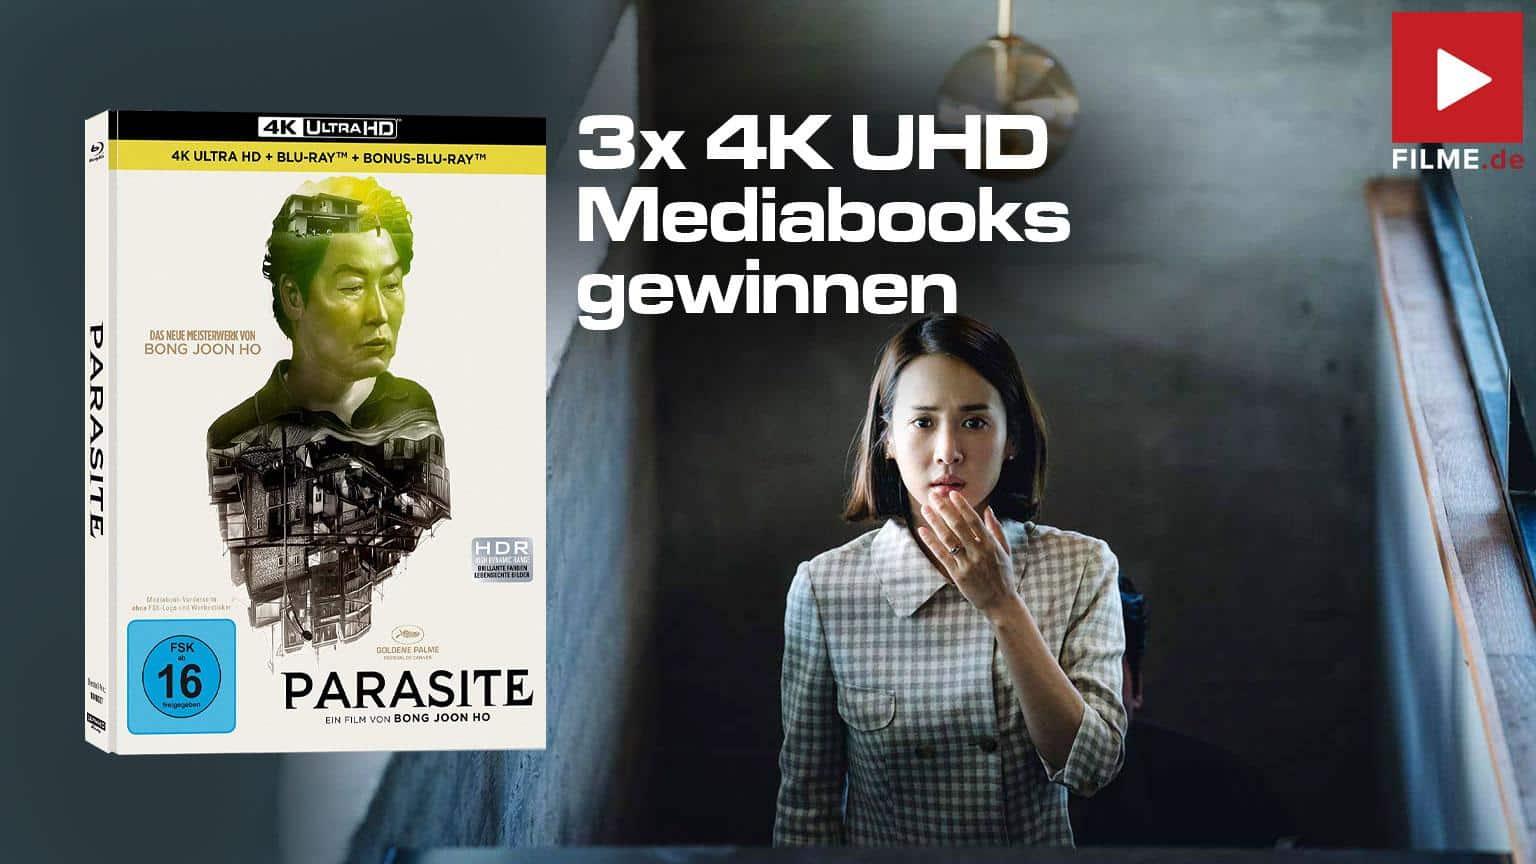 Parasite 4K UHD Mediabook Gewinnspiel Artikelbild